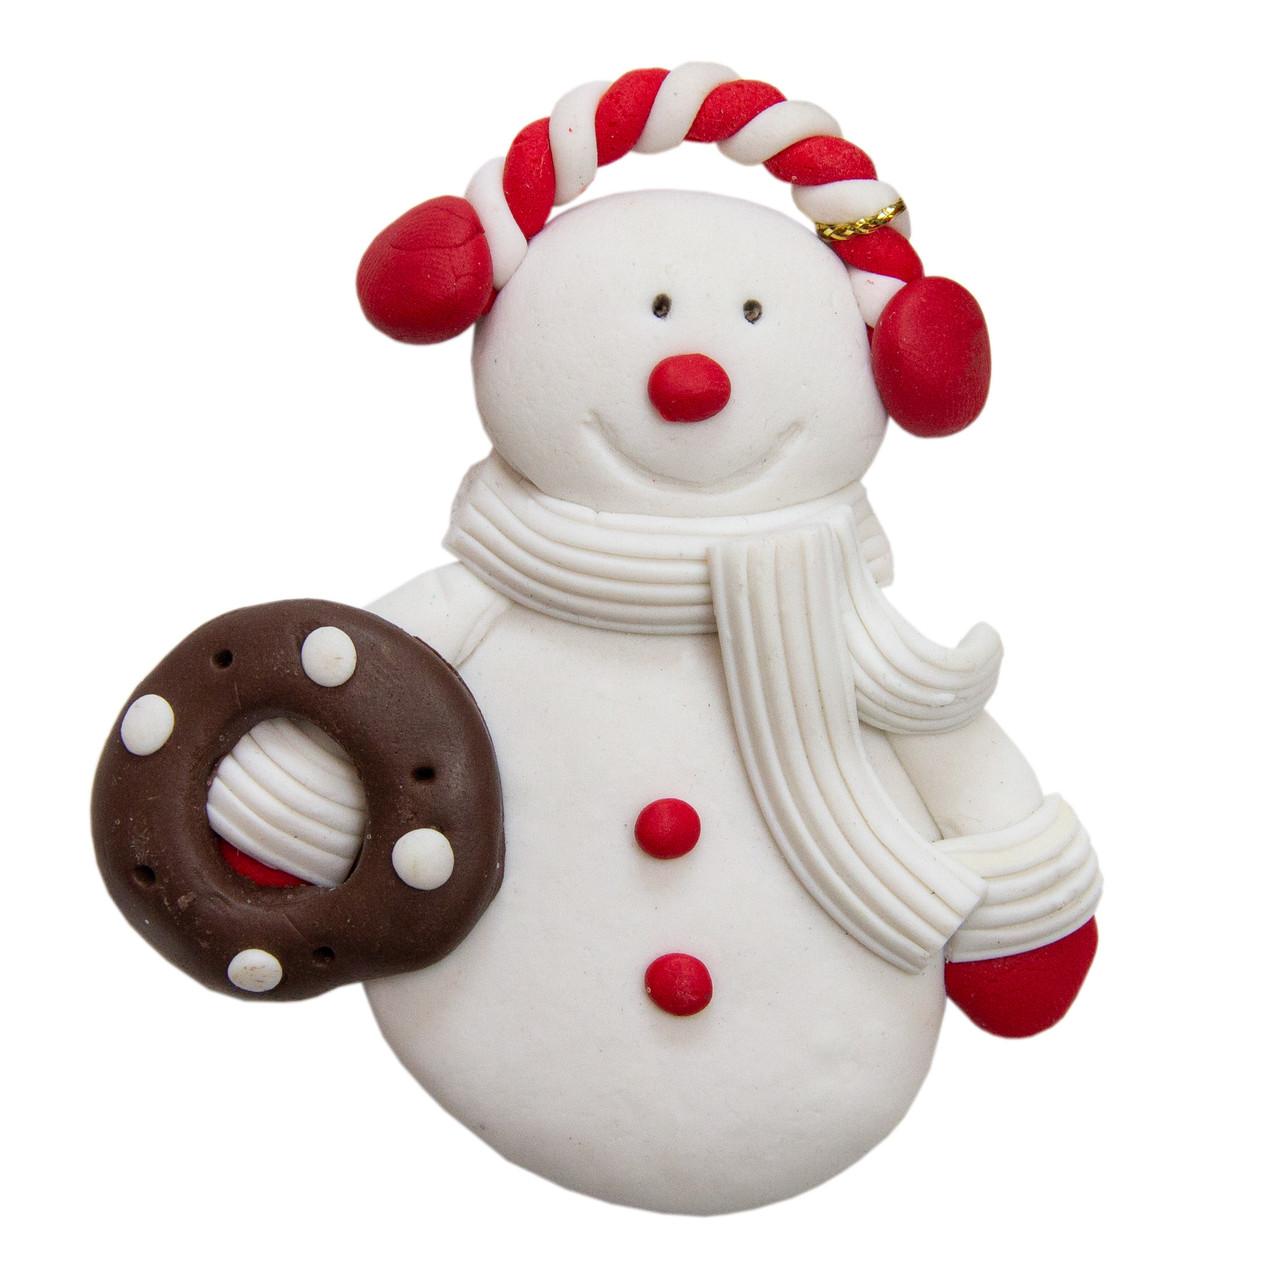 Фигурка сувенирная, полирезин, 8см, Снеговик, (000661-4)